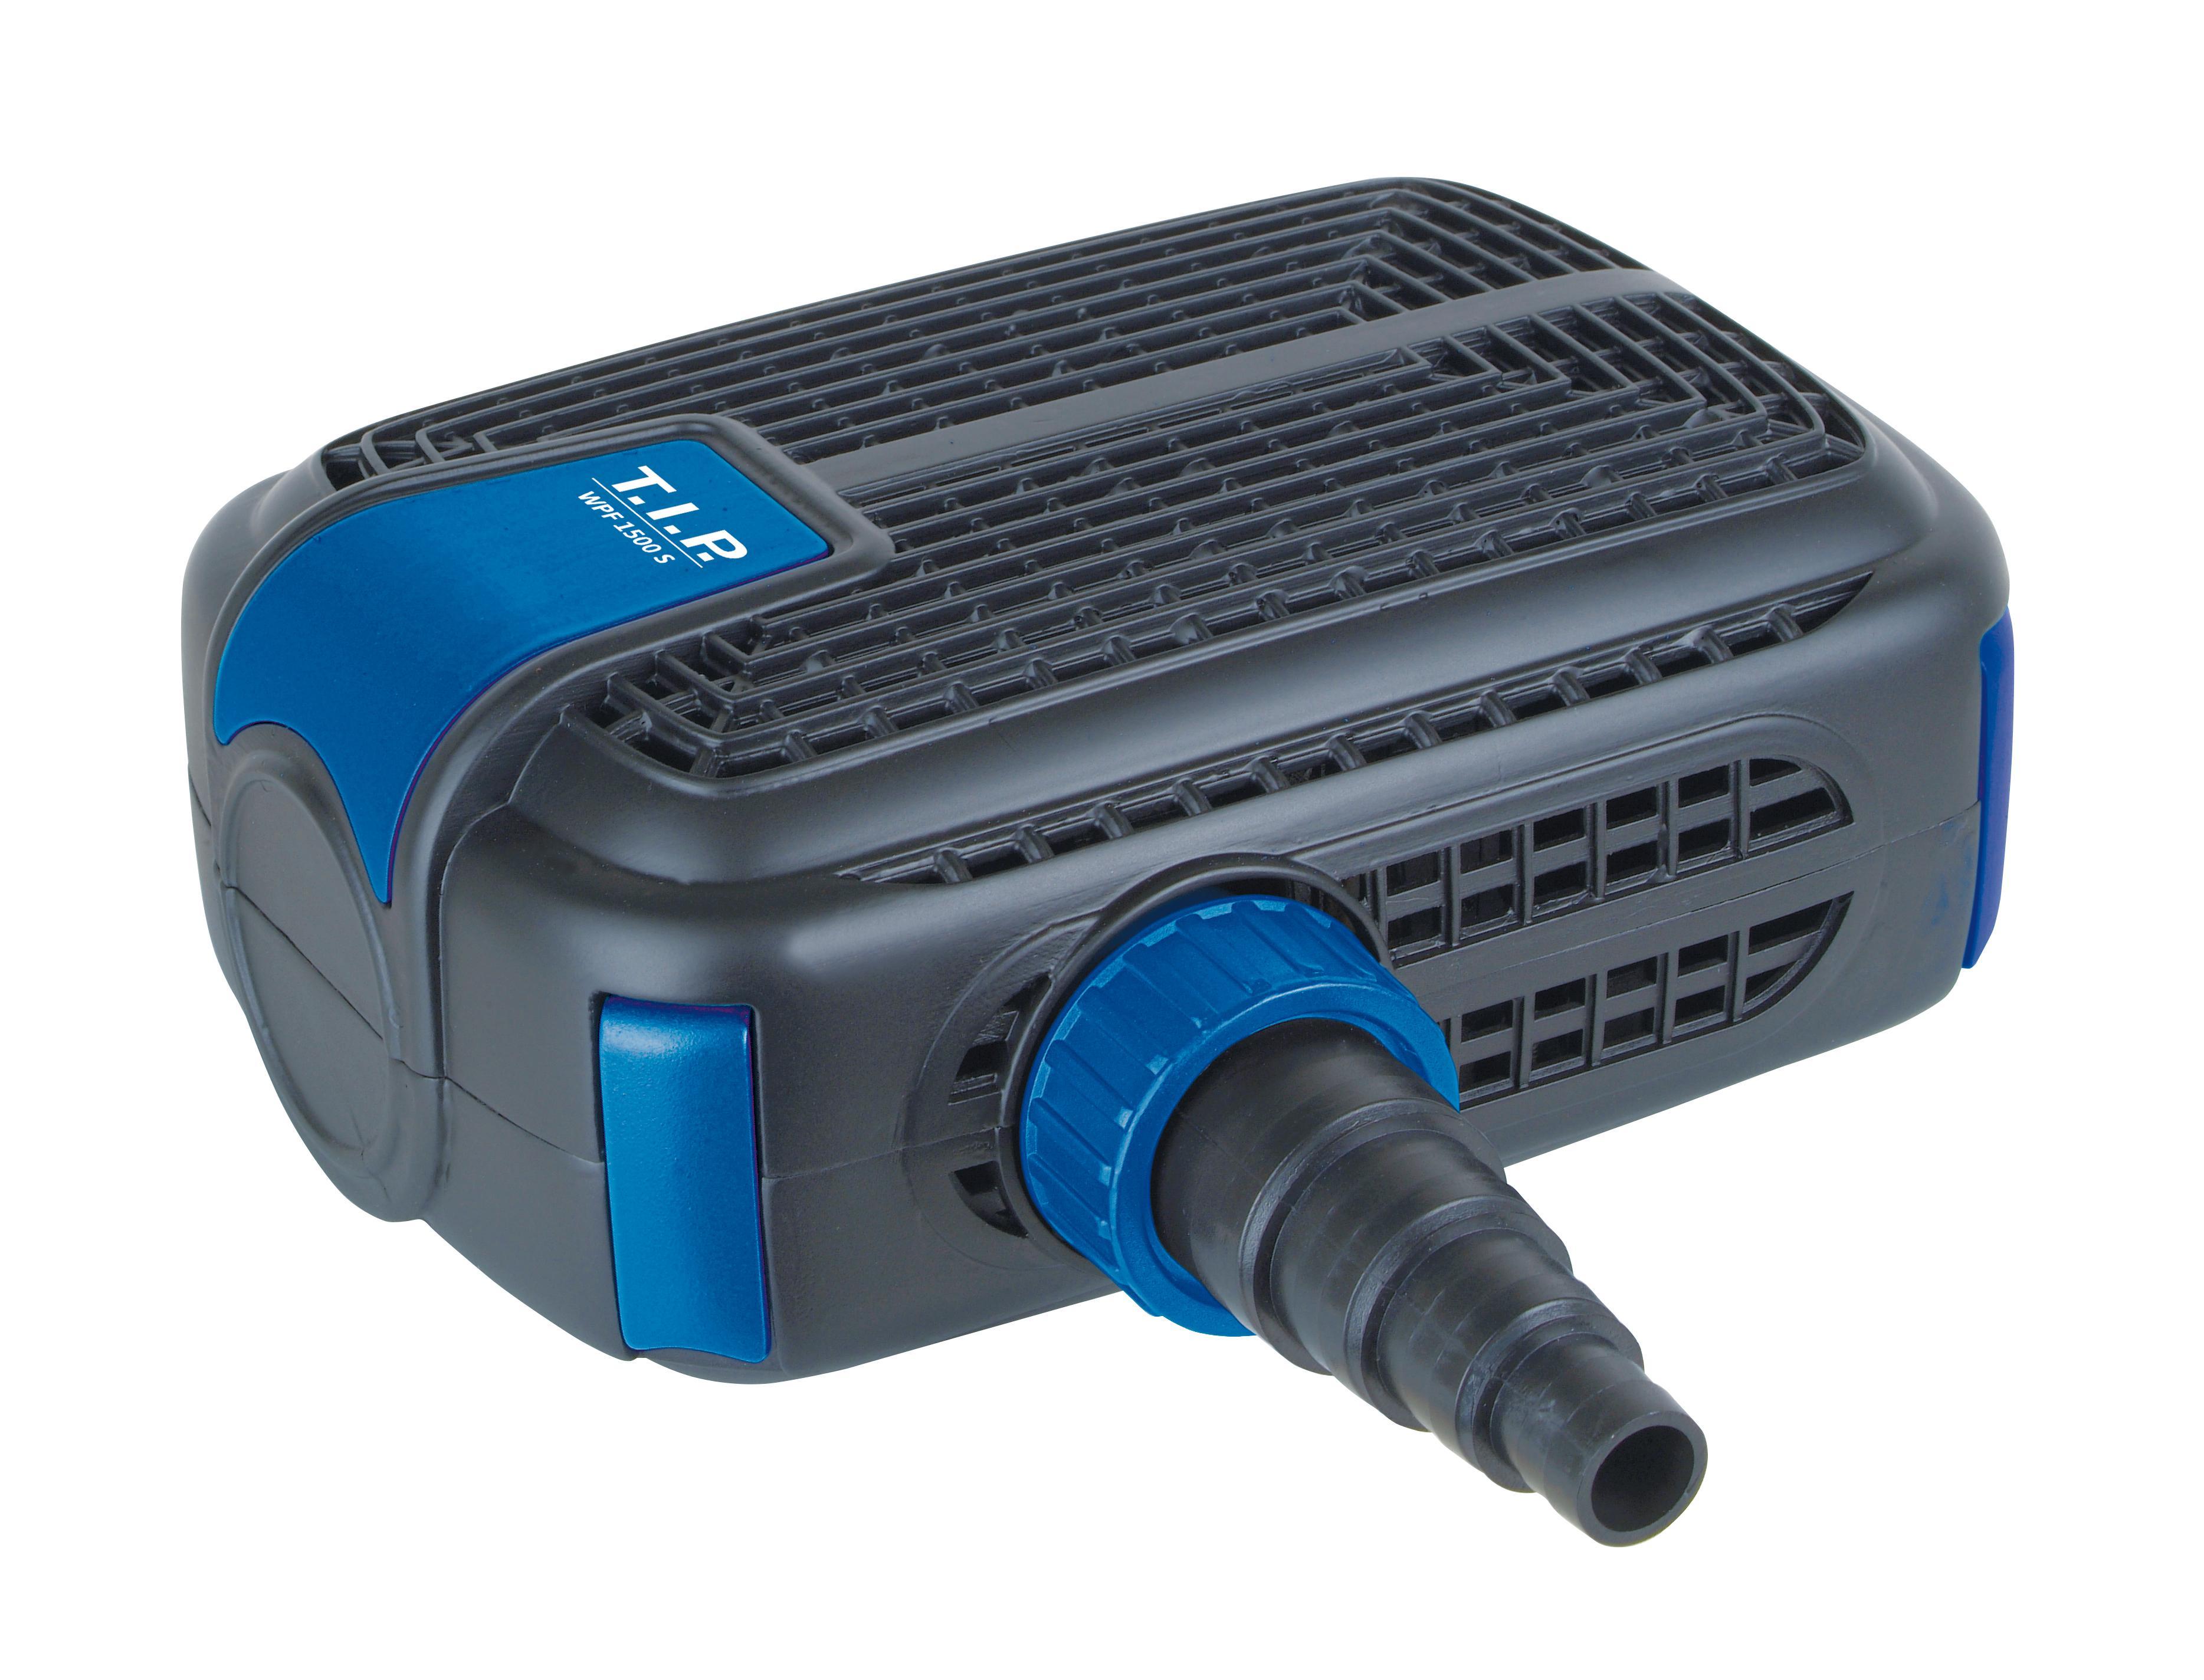 Sehr T.I.P. Multifunktions-Teichpumpe Wasserspiel Filter Bachlauf WPF DV76